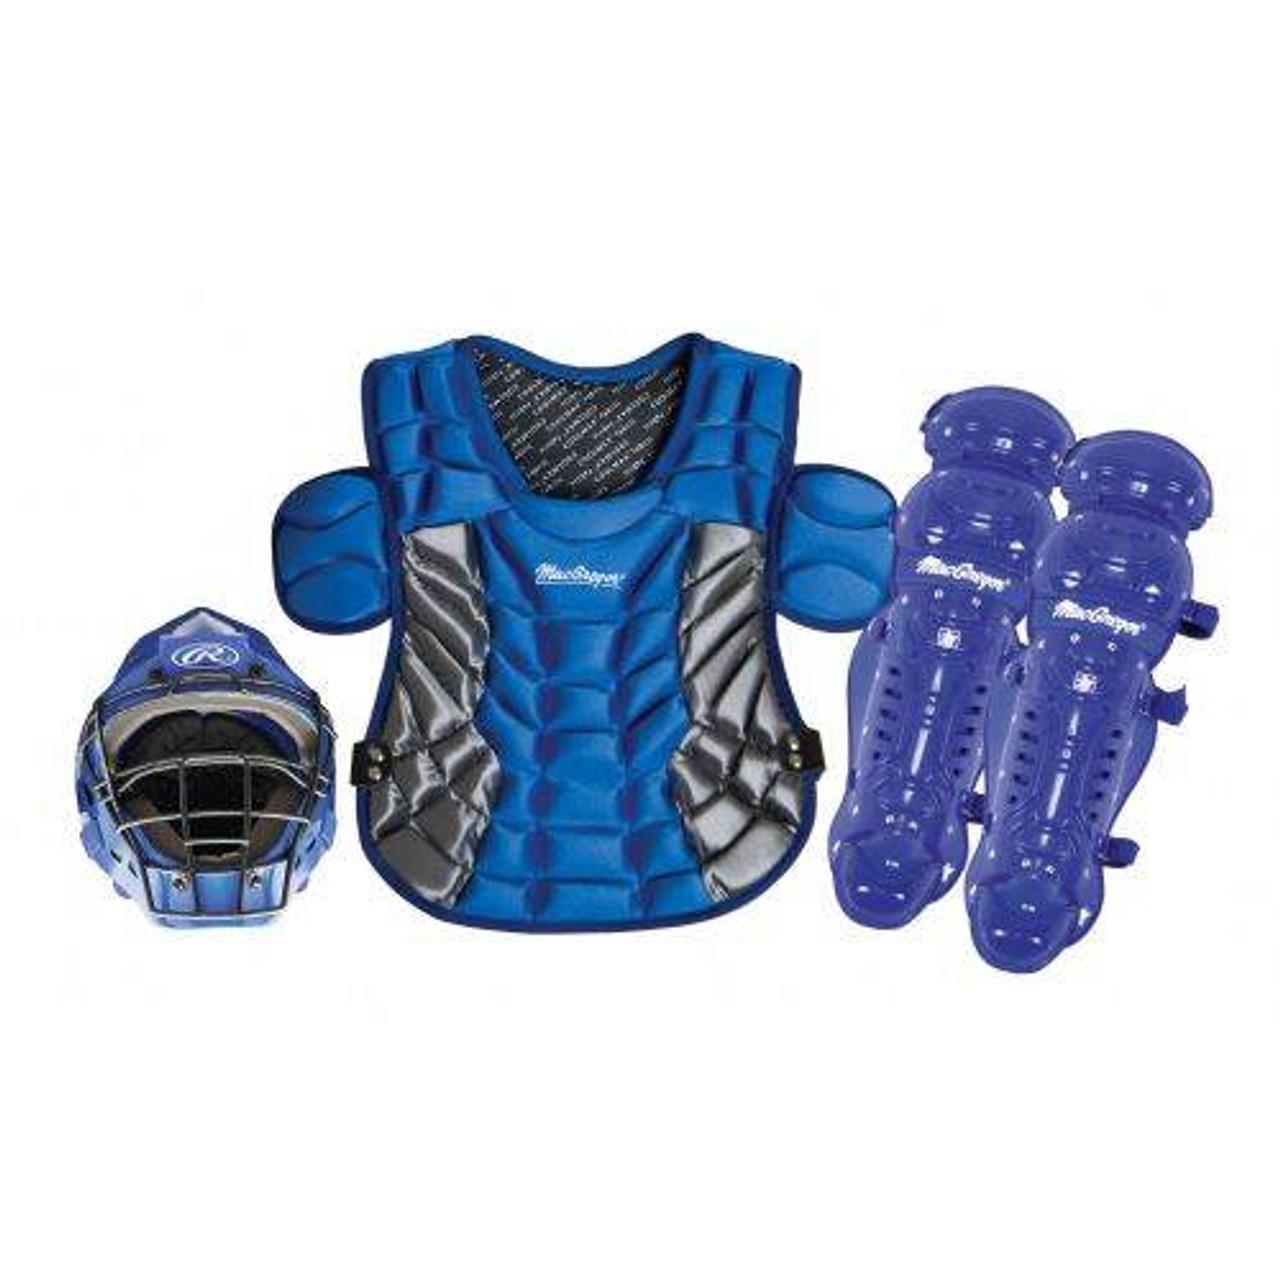 MacGregor baseball Girl's Catcher's Gear Pack